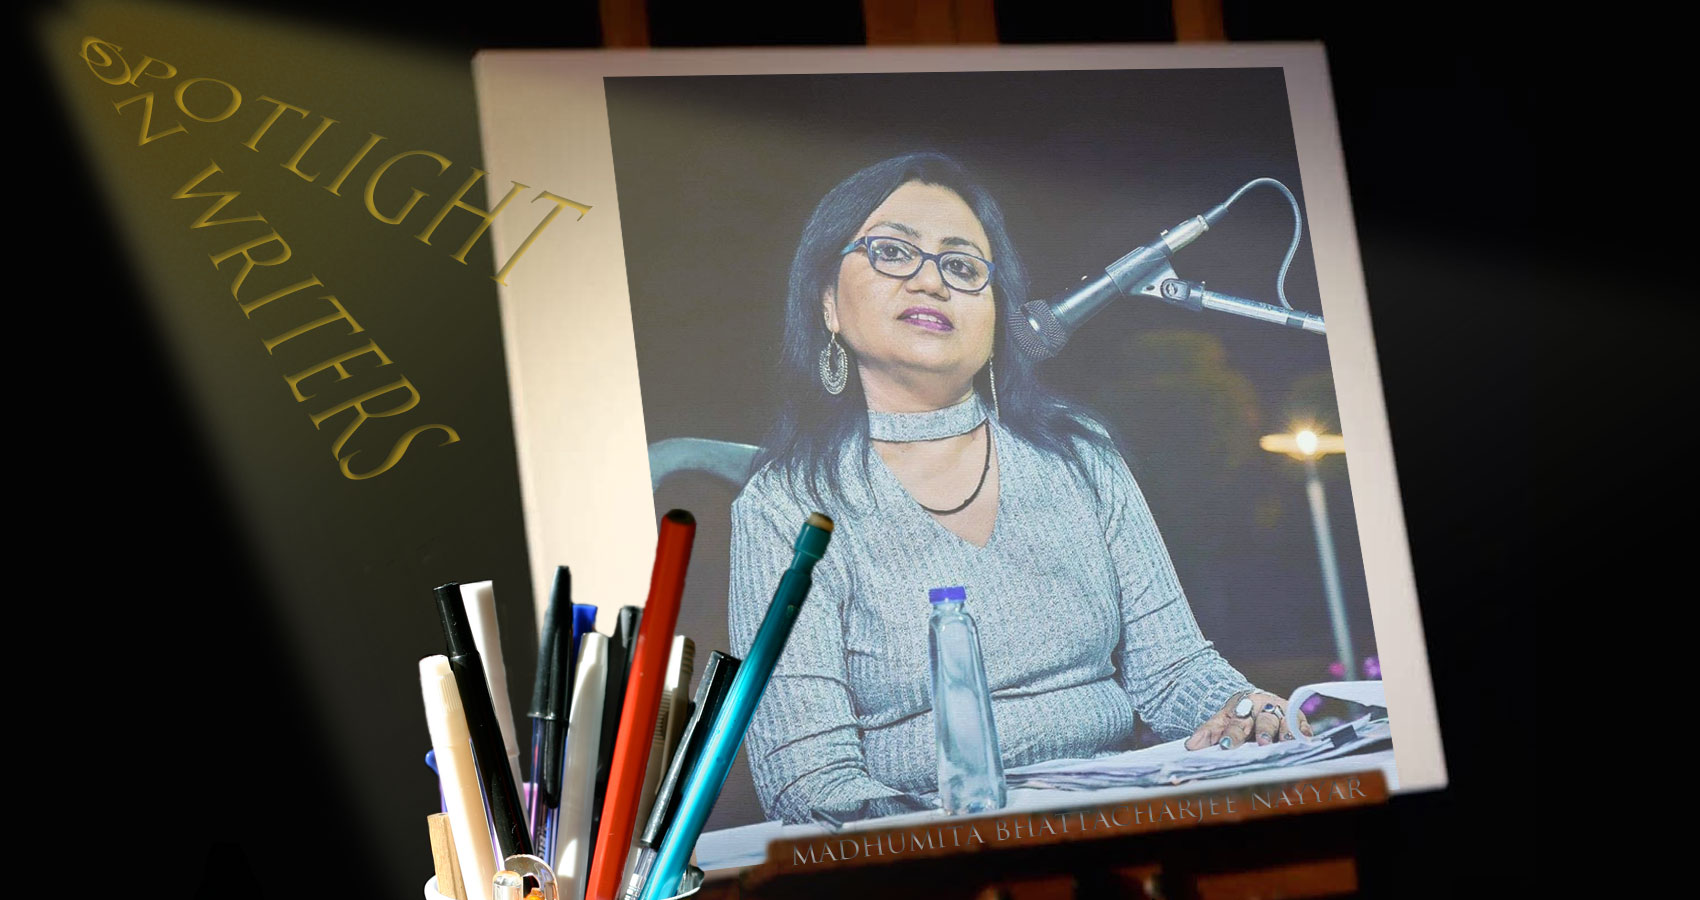 Spotlight On Writers - Madhumita Bhattacharjee, interview at Spillwords.com